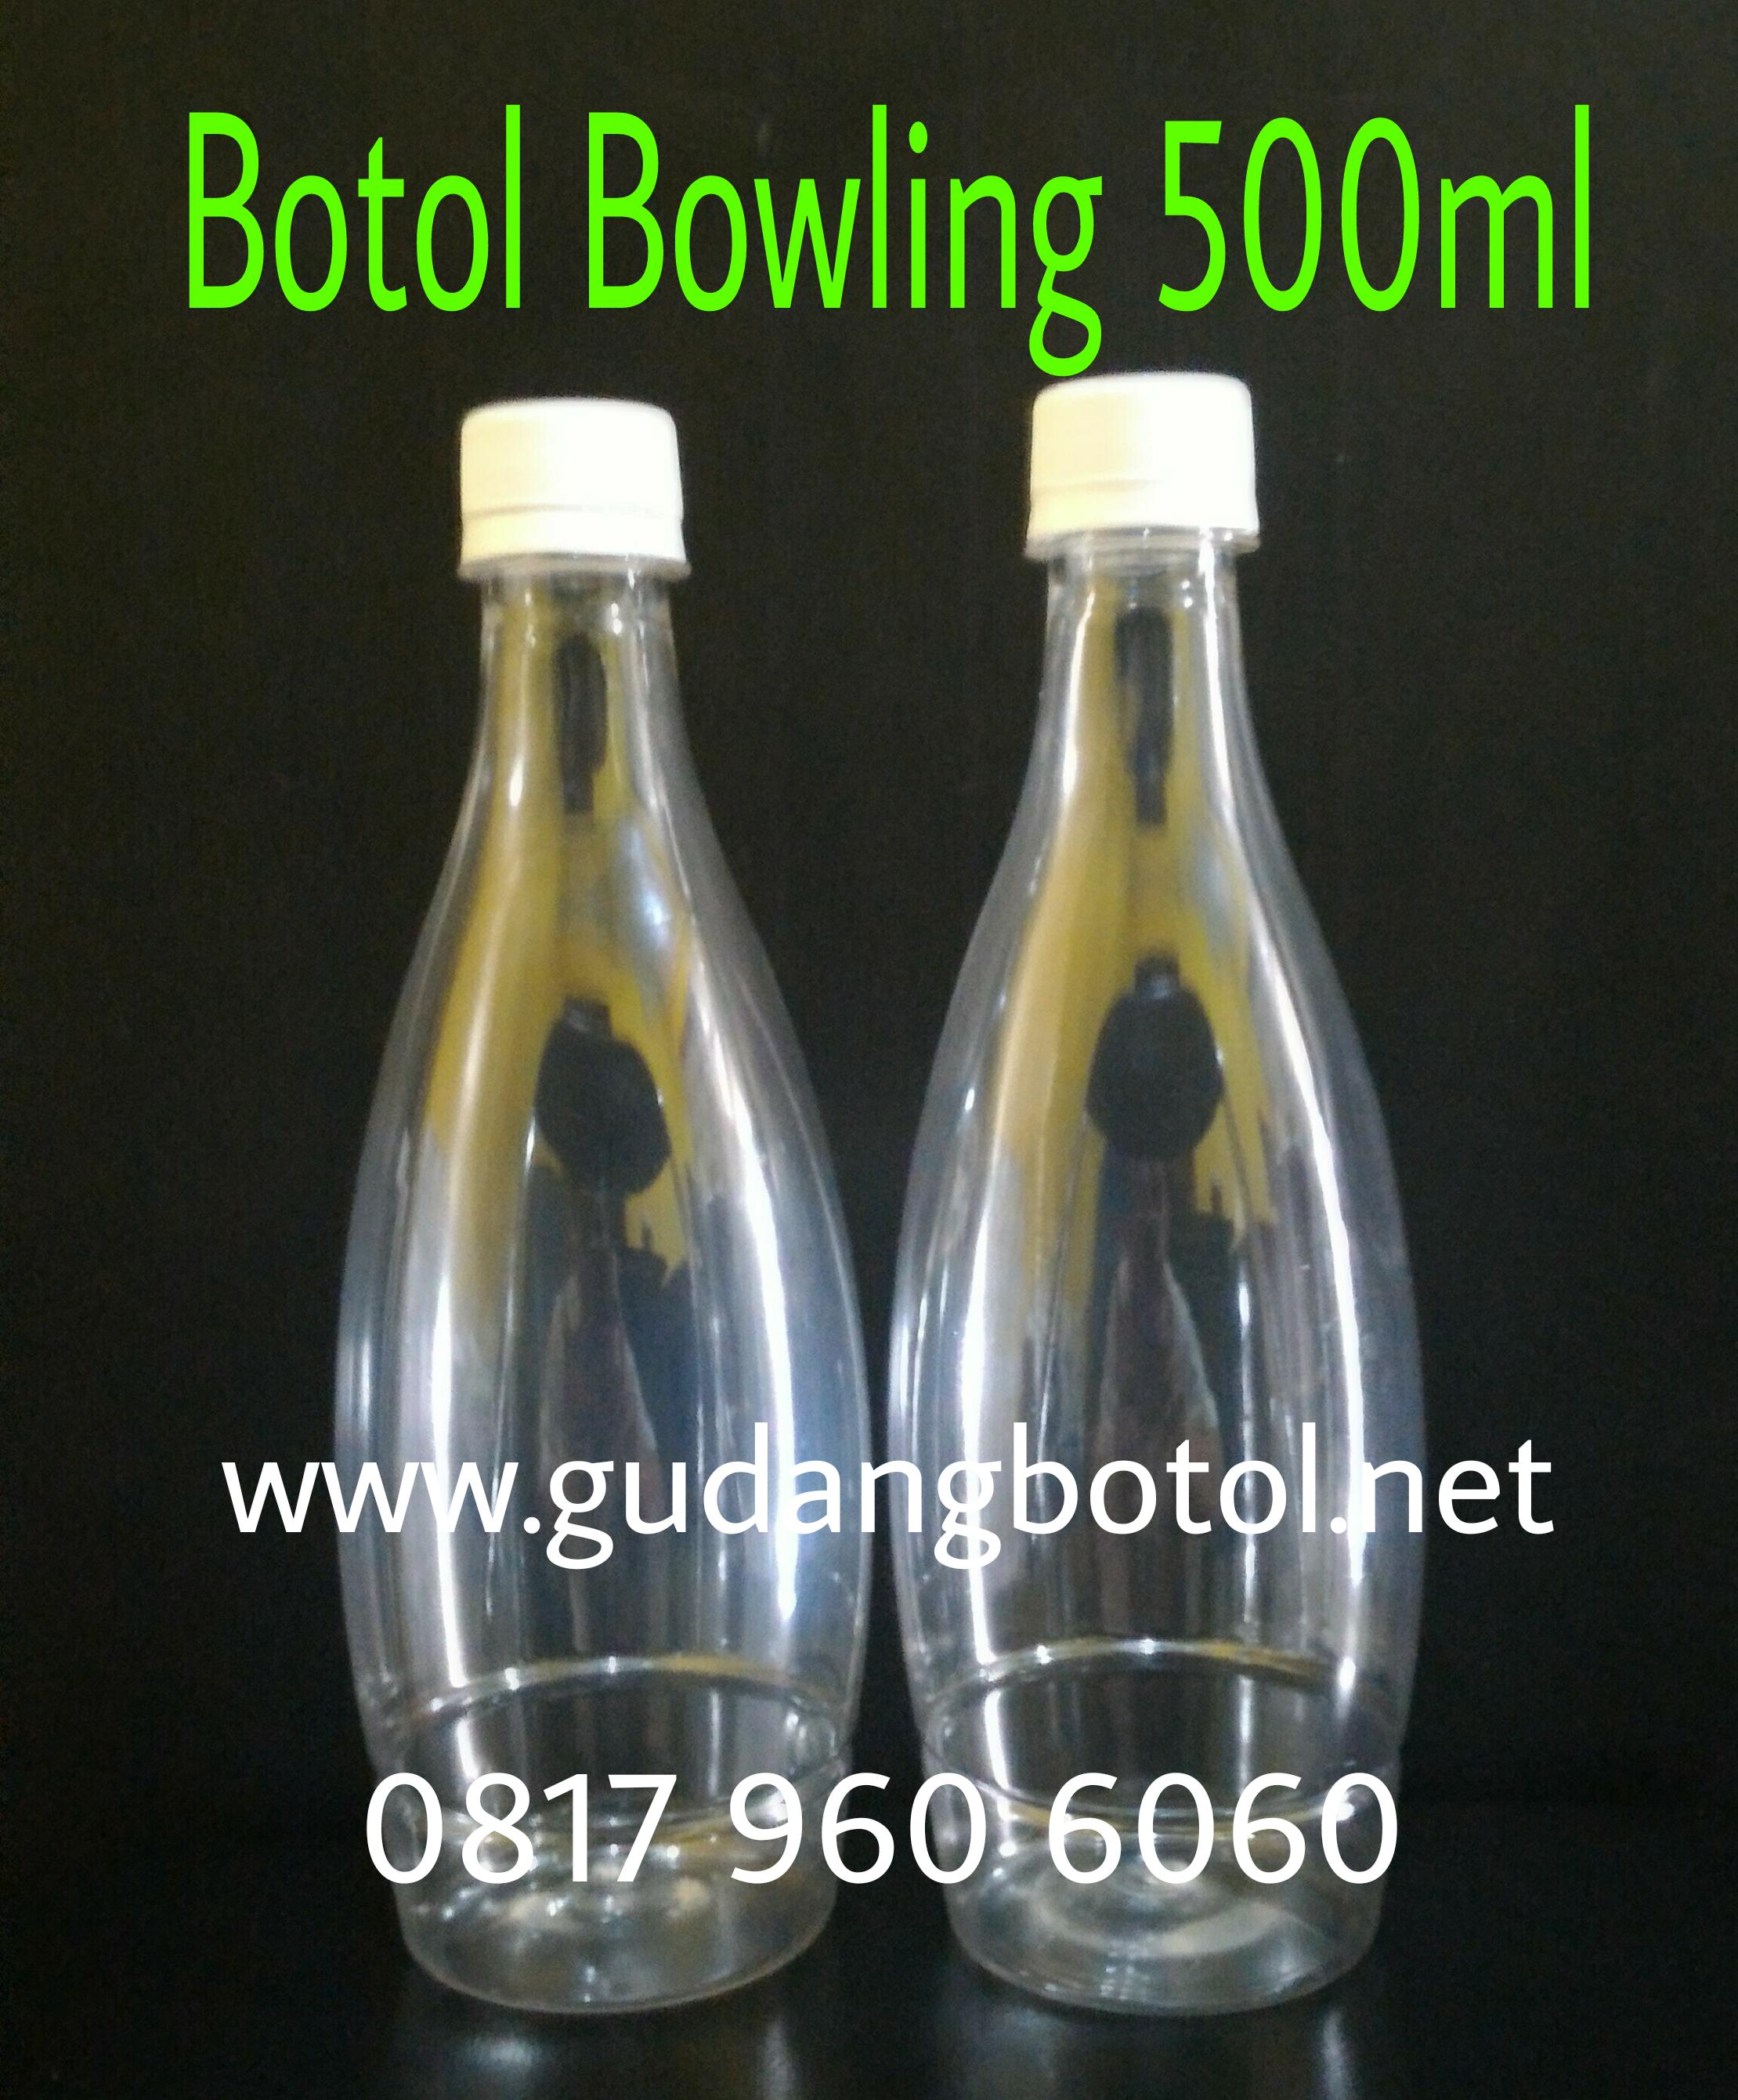 Botol Bowling